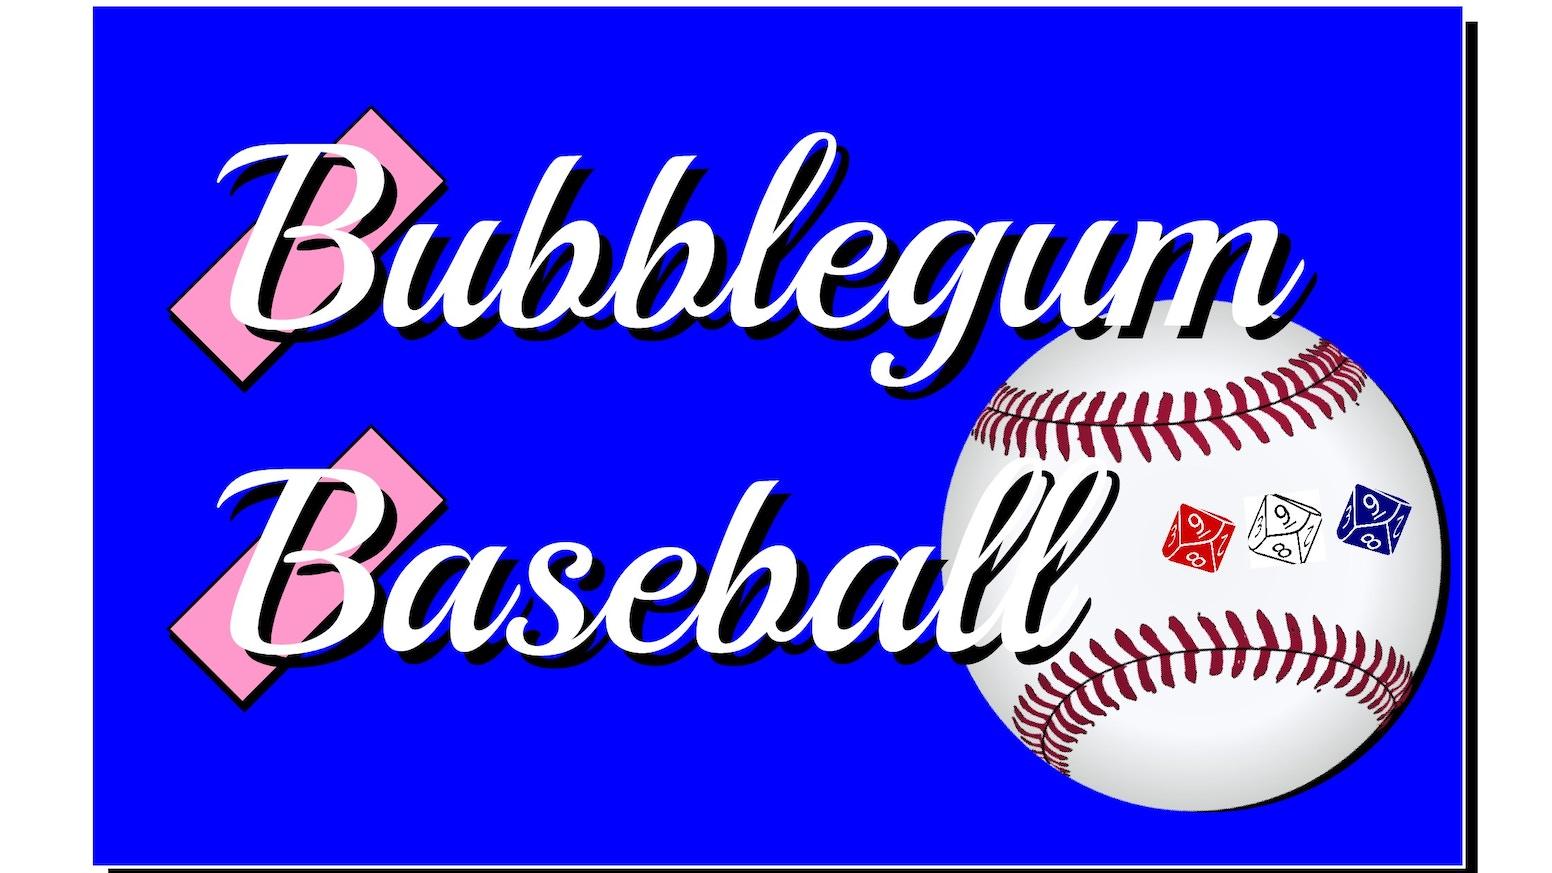 Bubblegum Baseball By Knuckledown Press Llc Print And Play